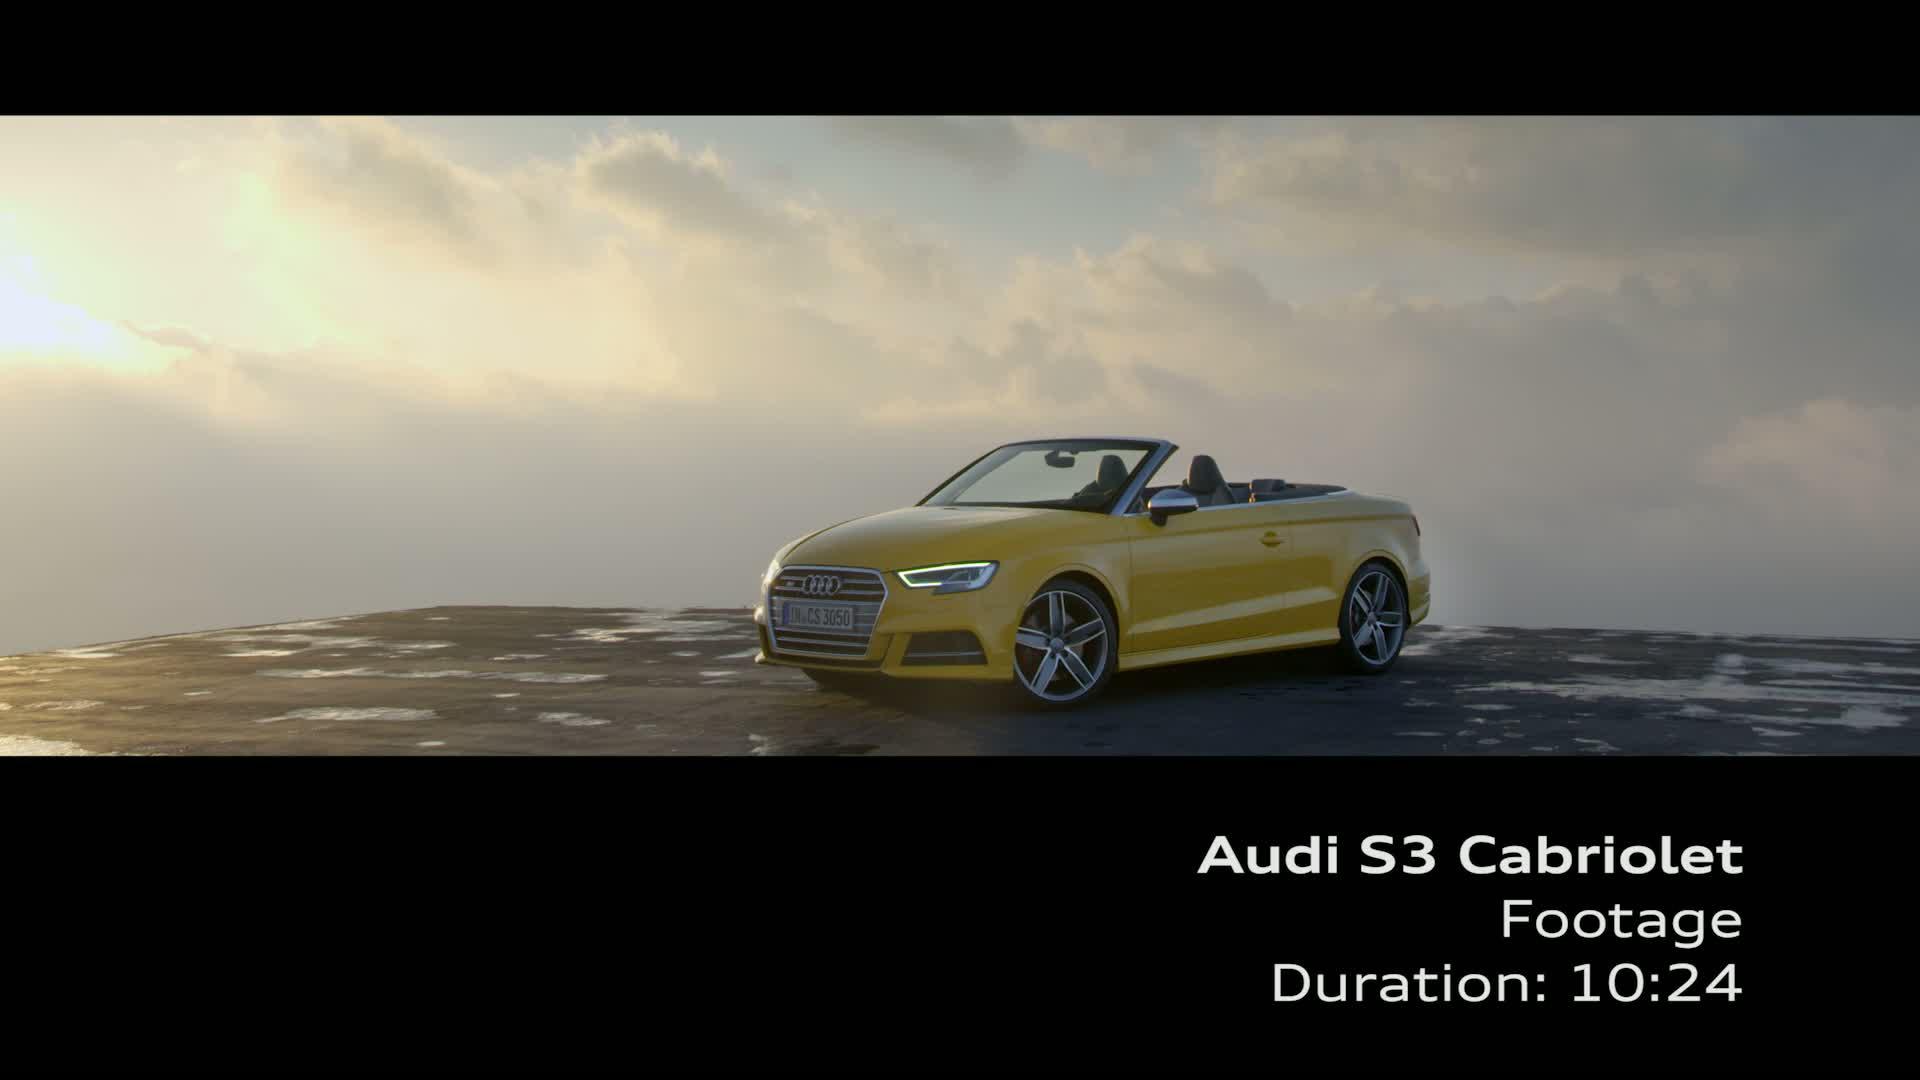 Audi S3 Cabriolet - Footage